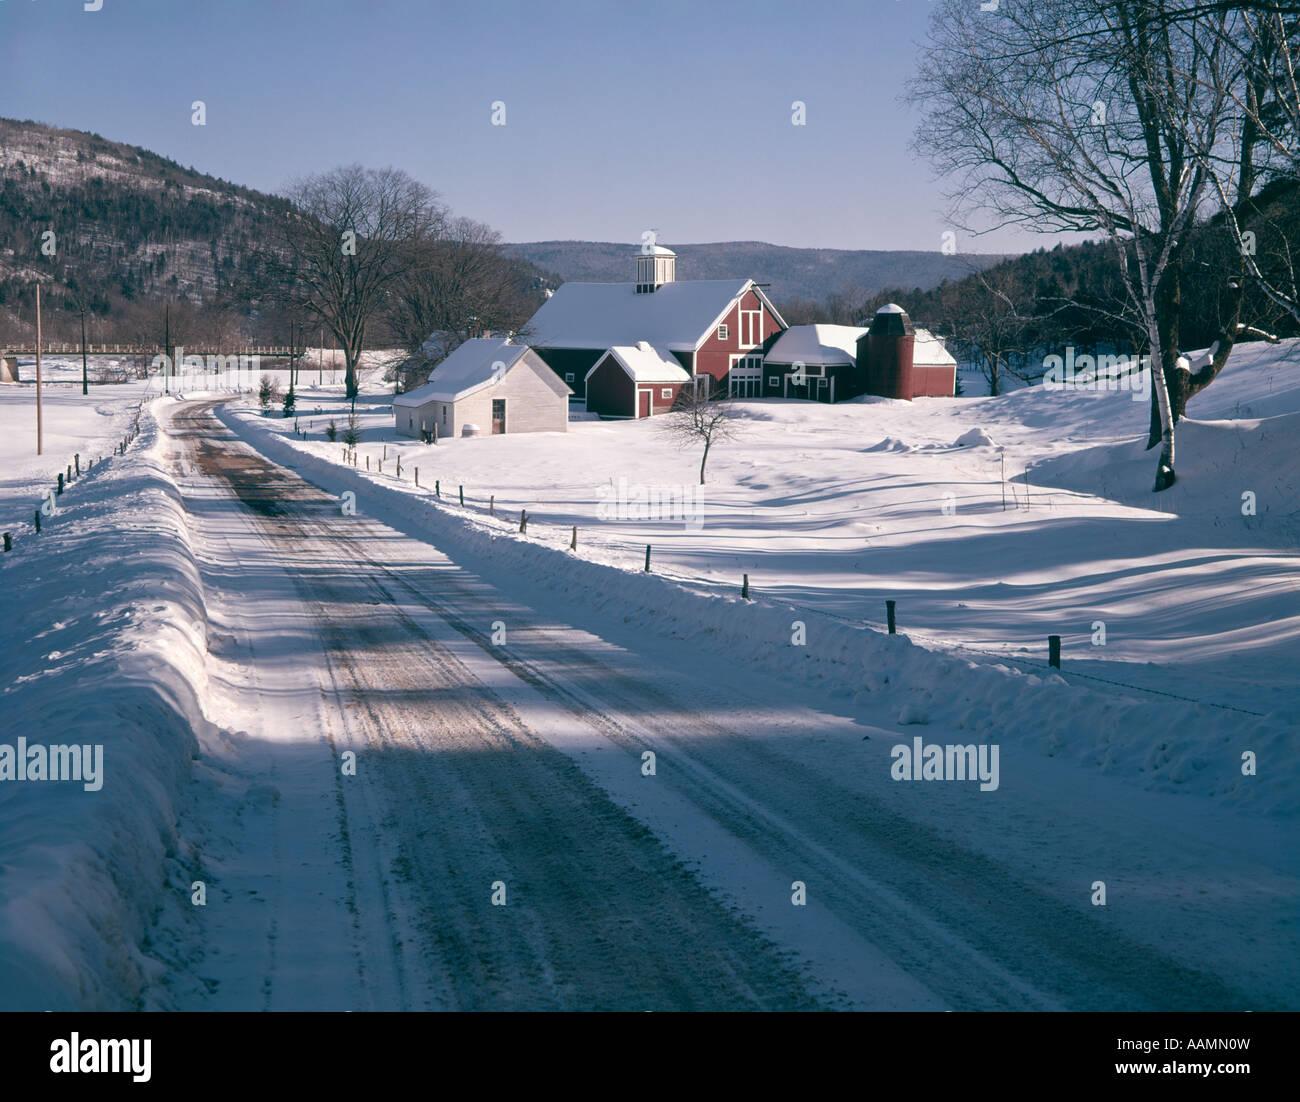 WINTER SCENE ROAD AND BARN - Stock Image